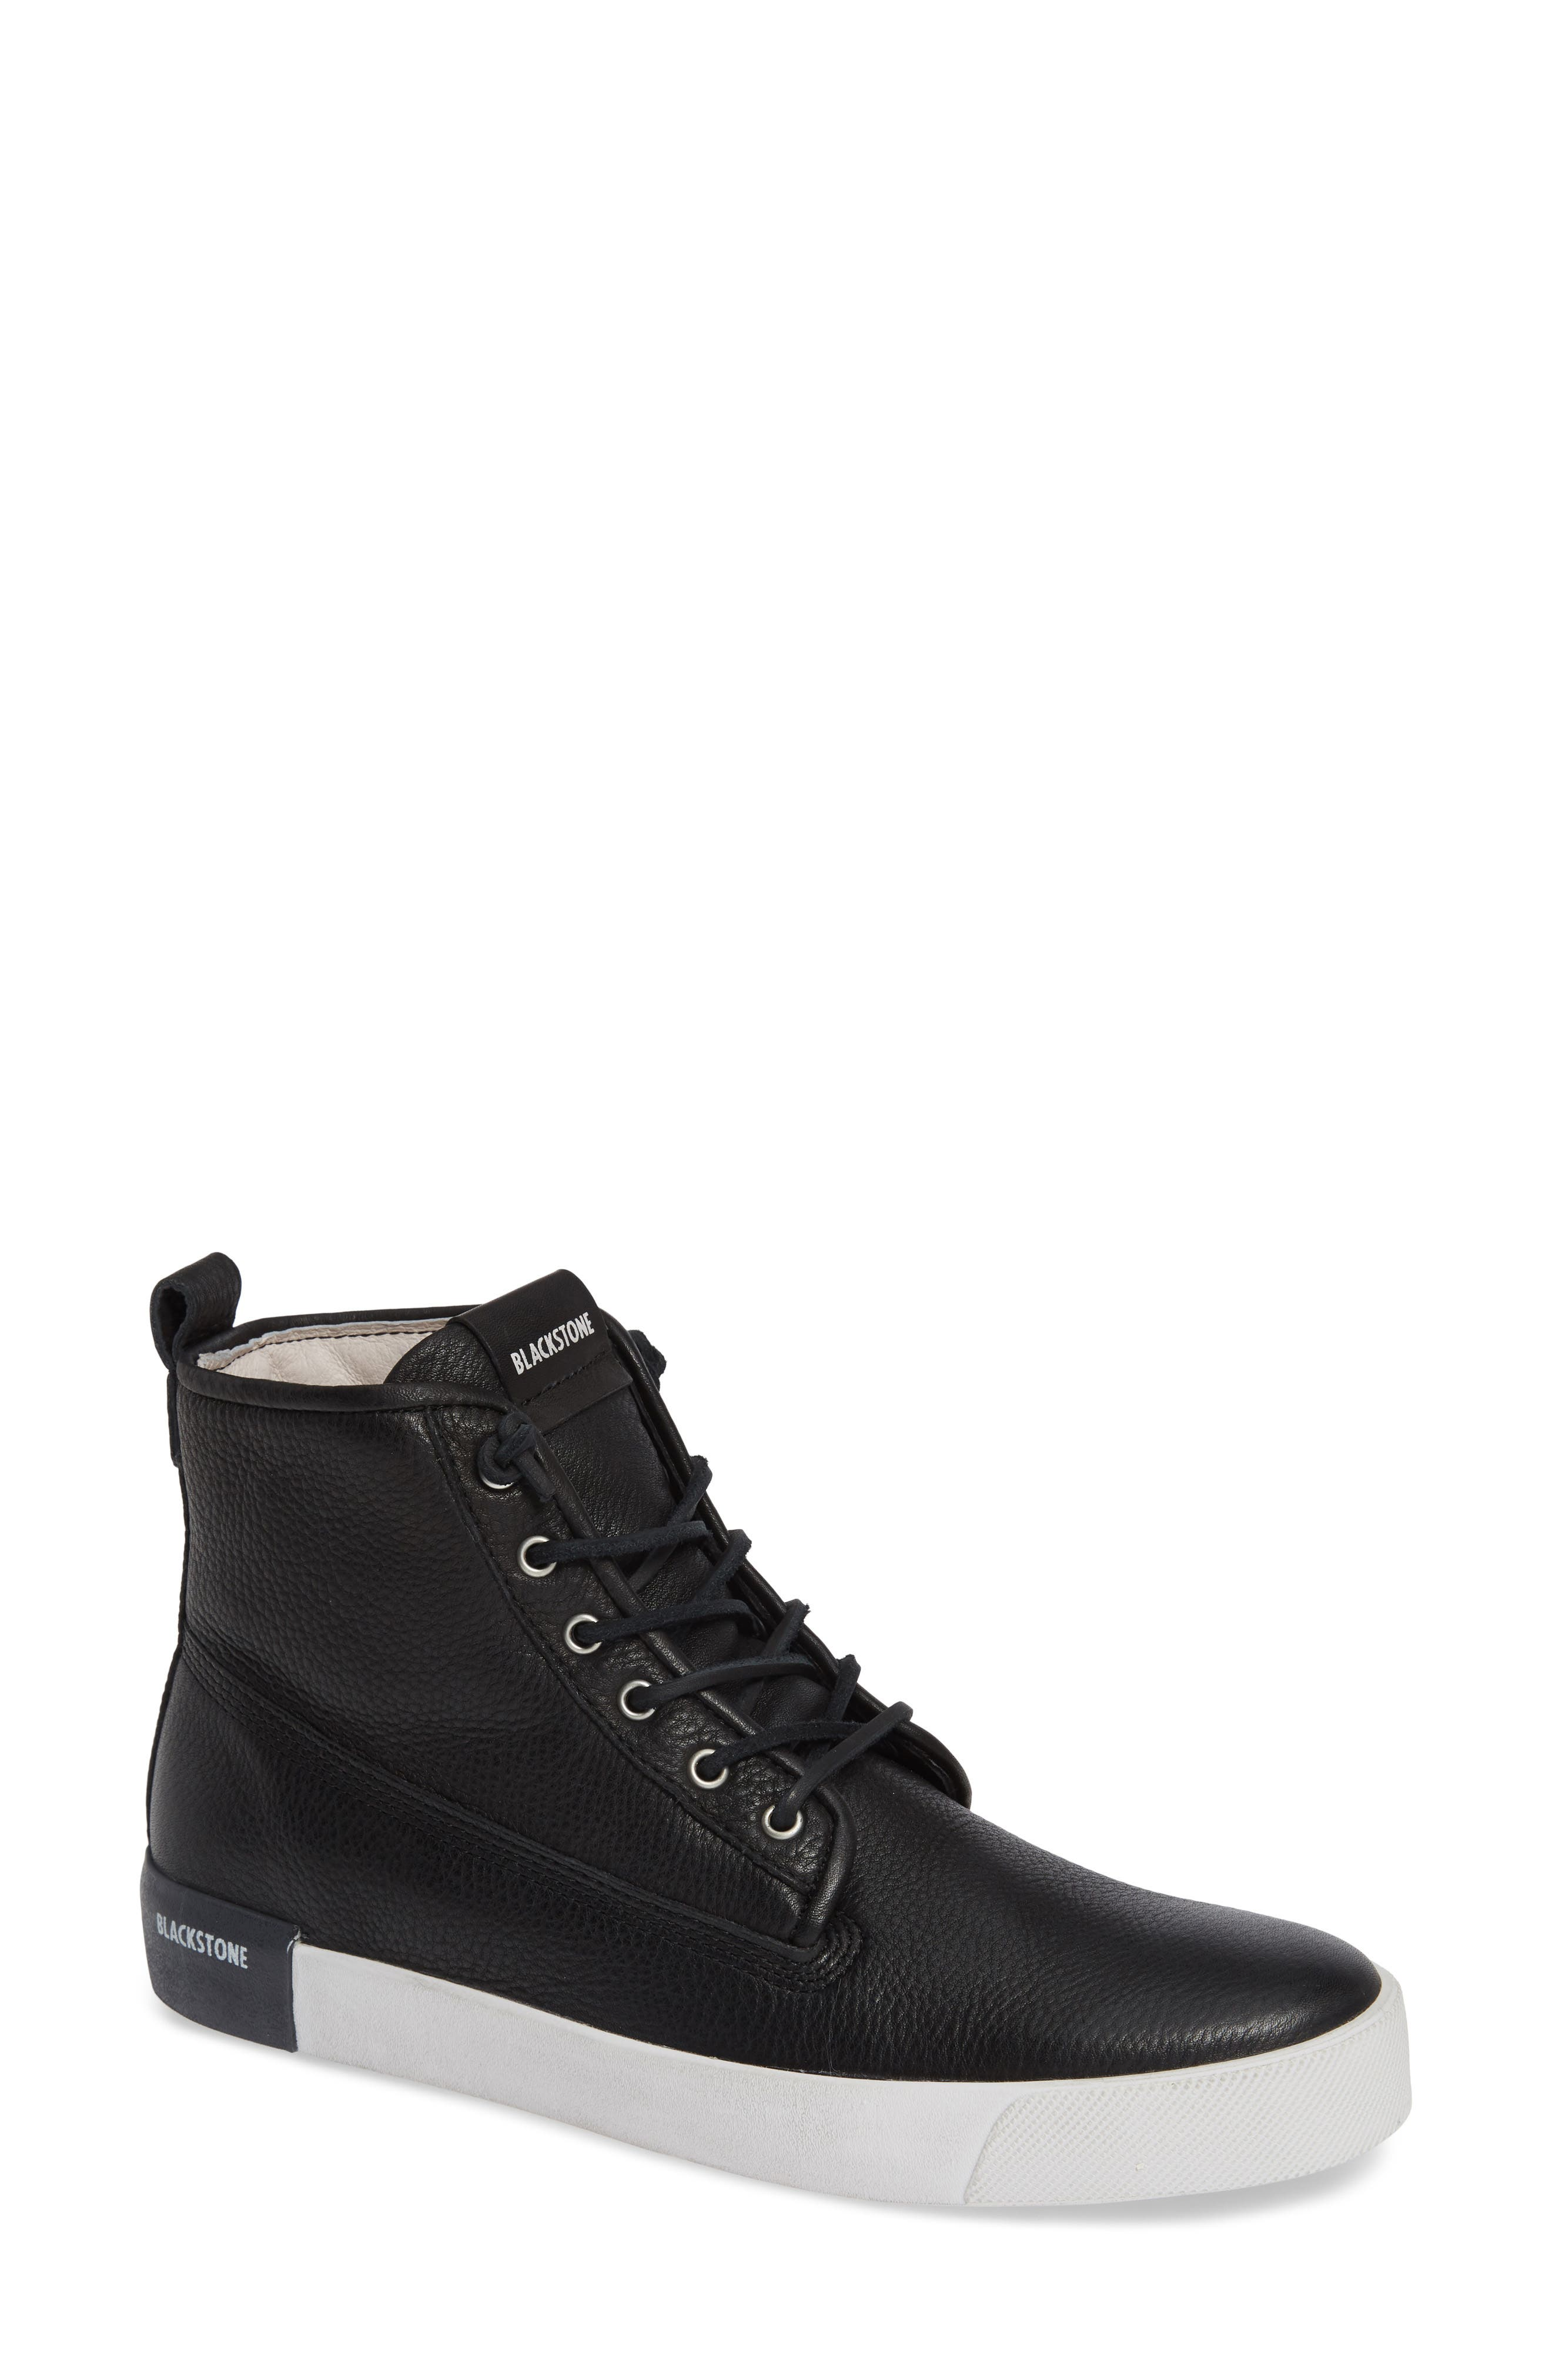 QM80 High Top Sneaker,                             Main thumbnail 1, color,                             BLACK